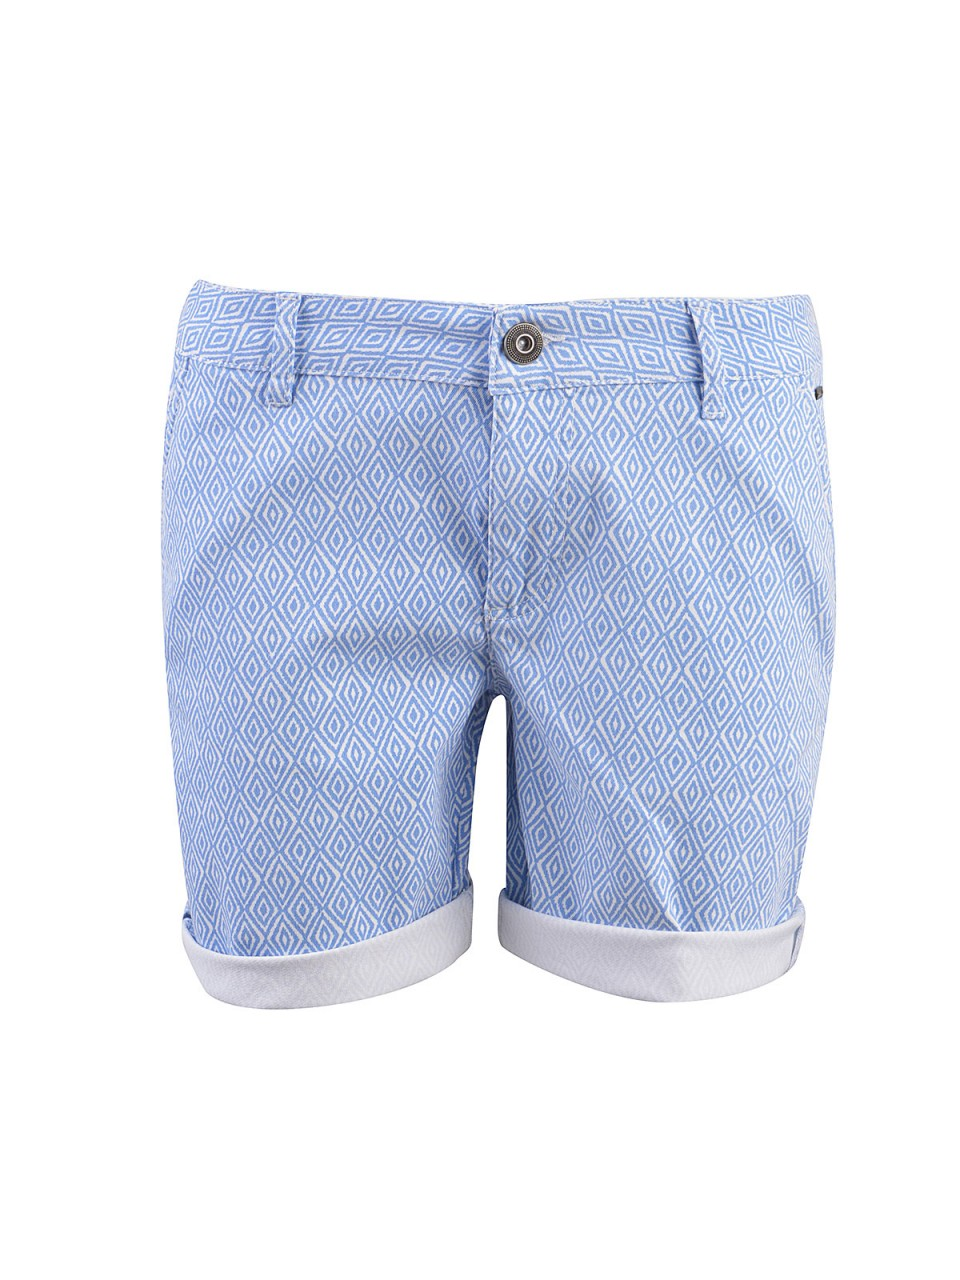 Hosen - SMITH SOUL Damen Shorts, blau  - Onlineshop Designermode.com